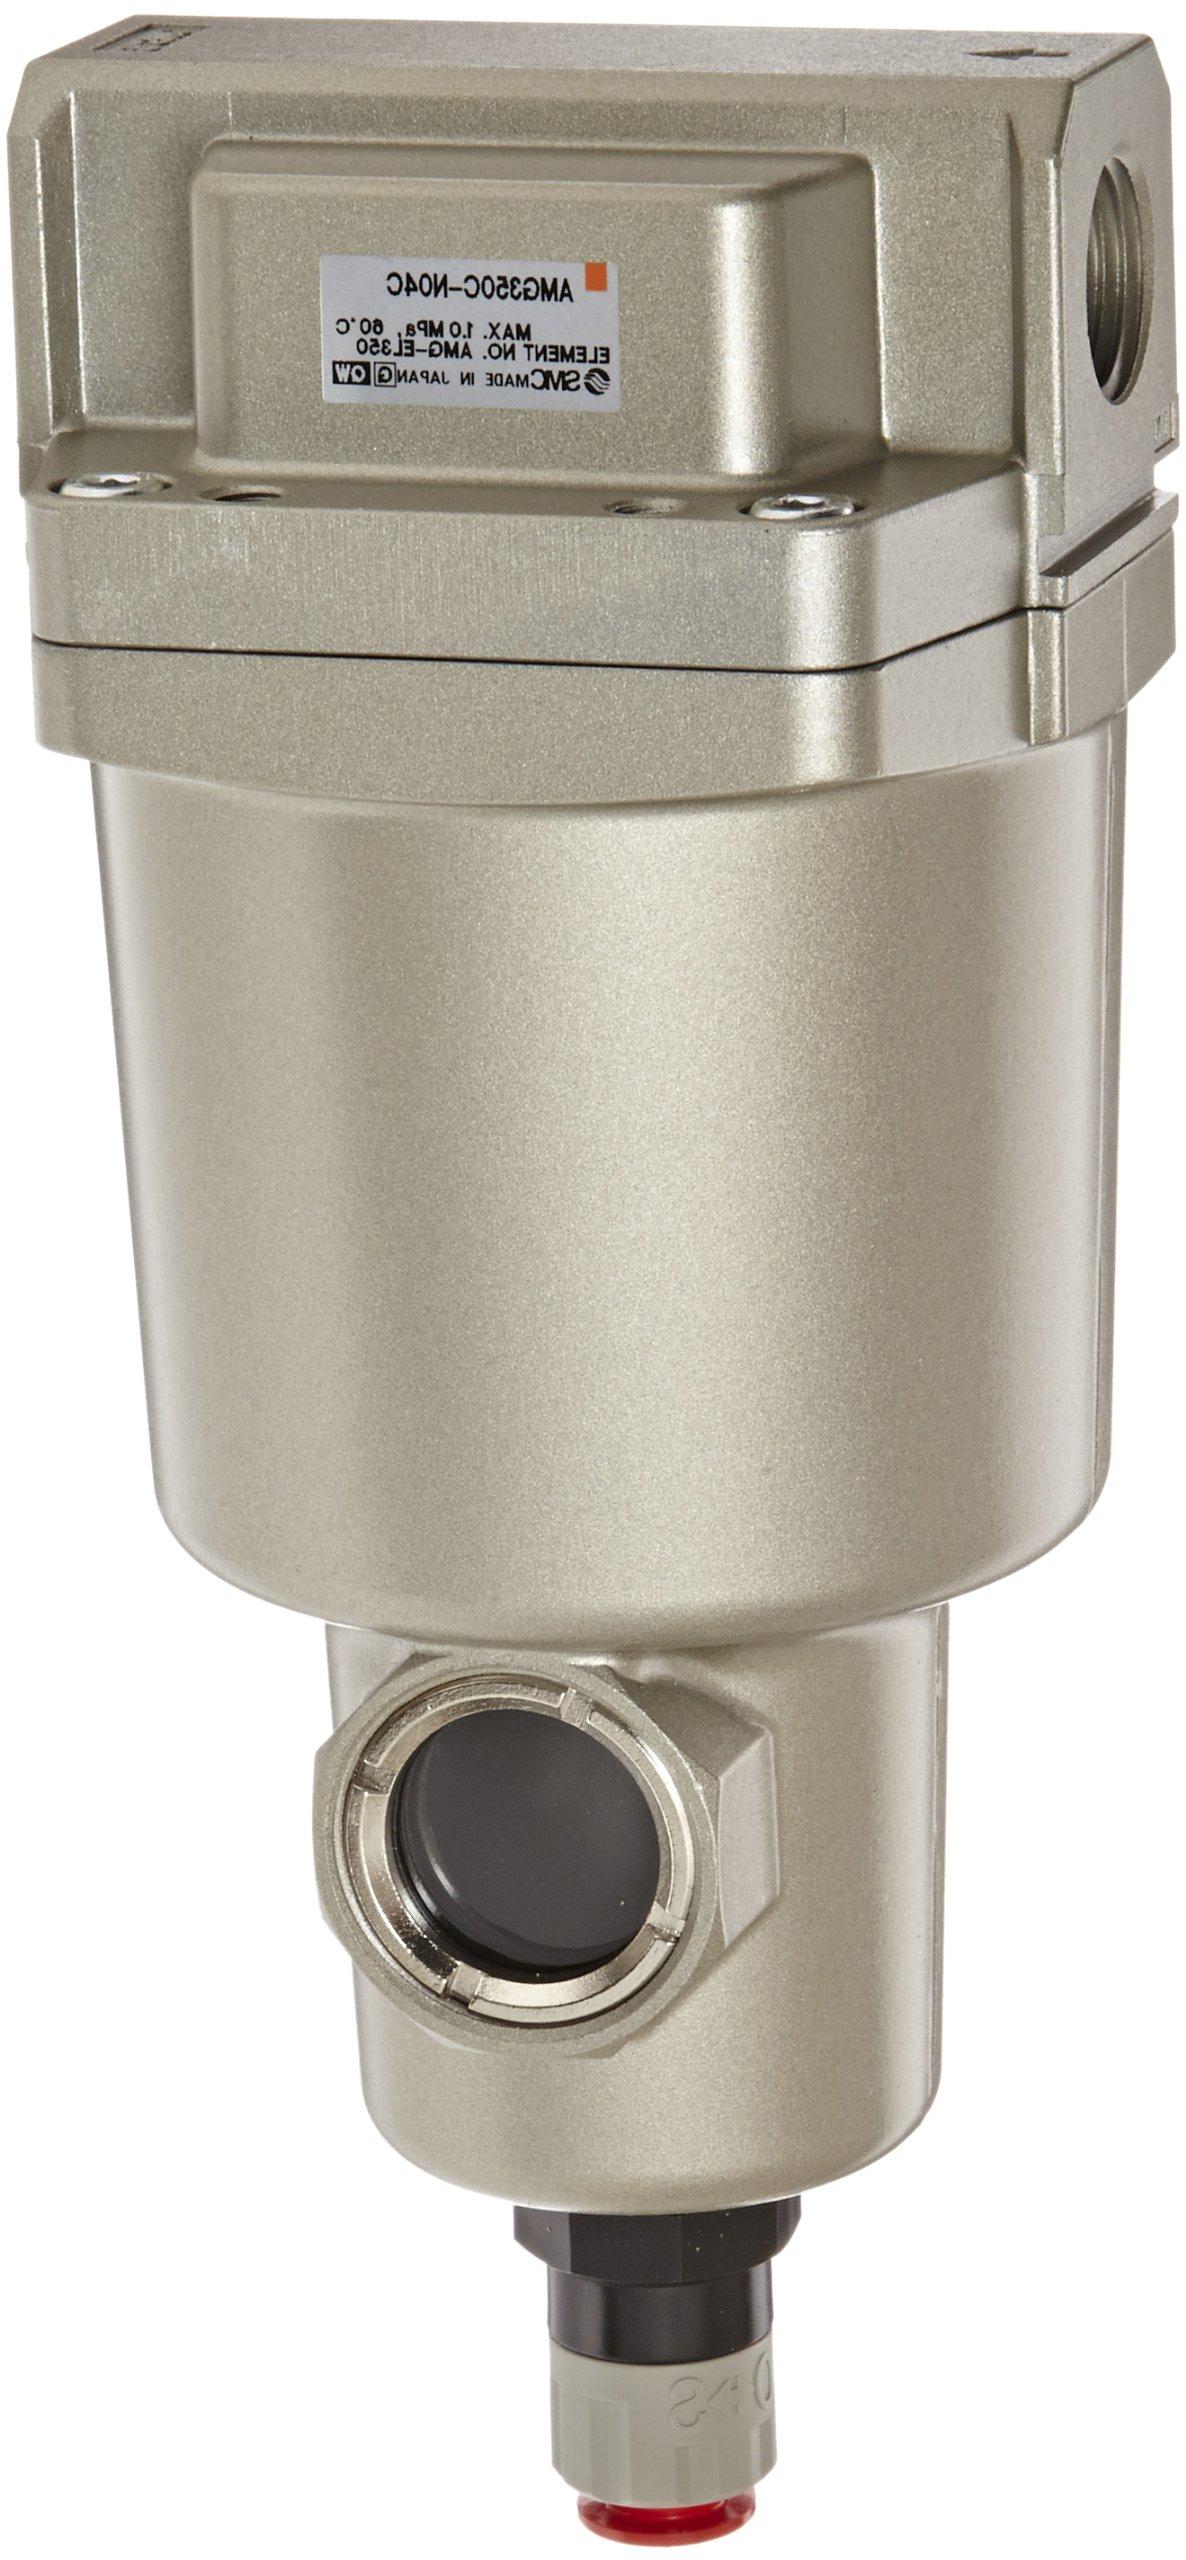 SMC AMG350C-N04C Water Separator, N.C. Auto Drain, 1,500 L/min, 1/2'' NPT